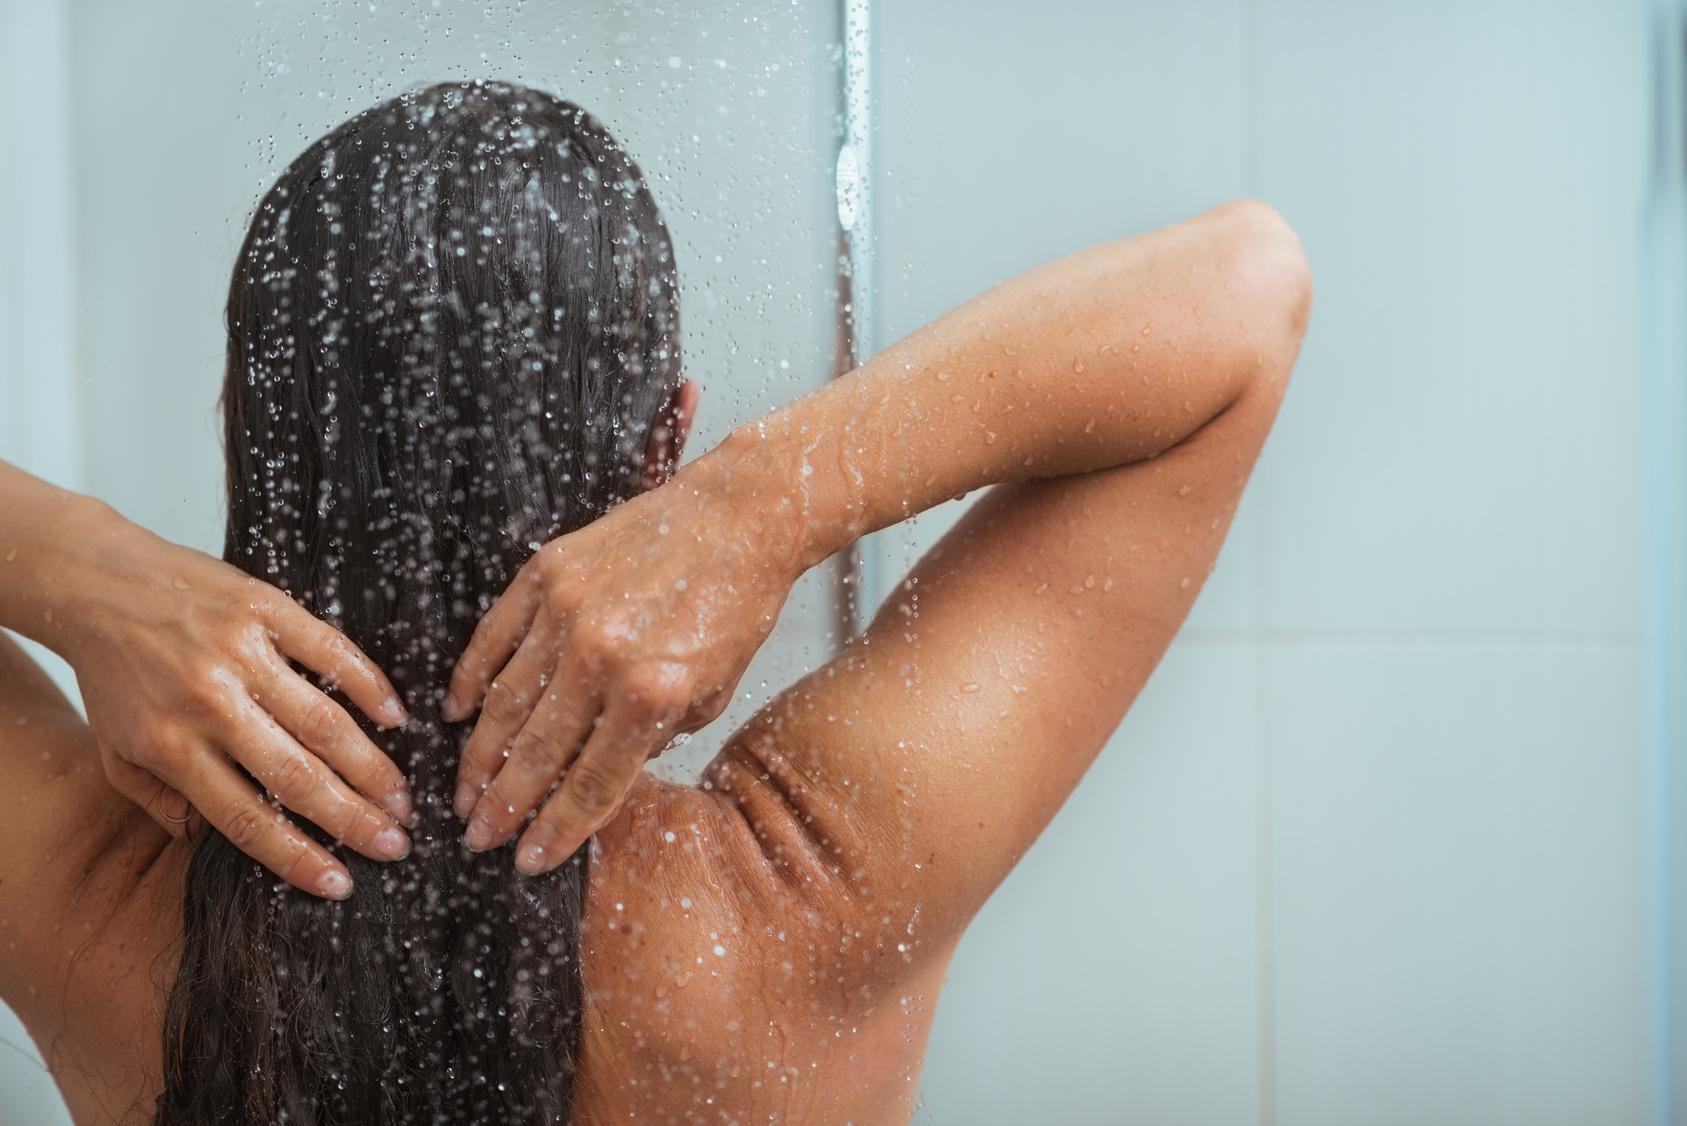 Woman washing long hair in shower under water jet